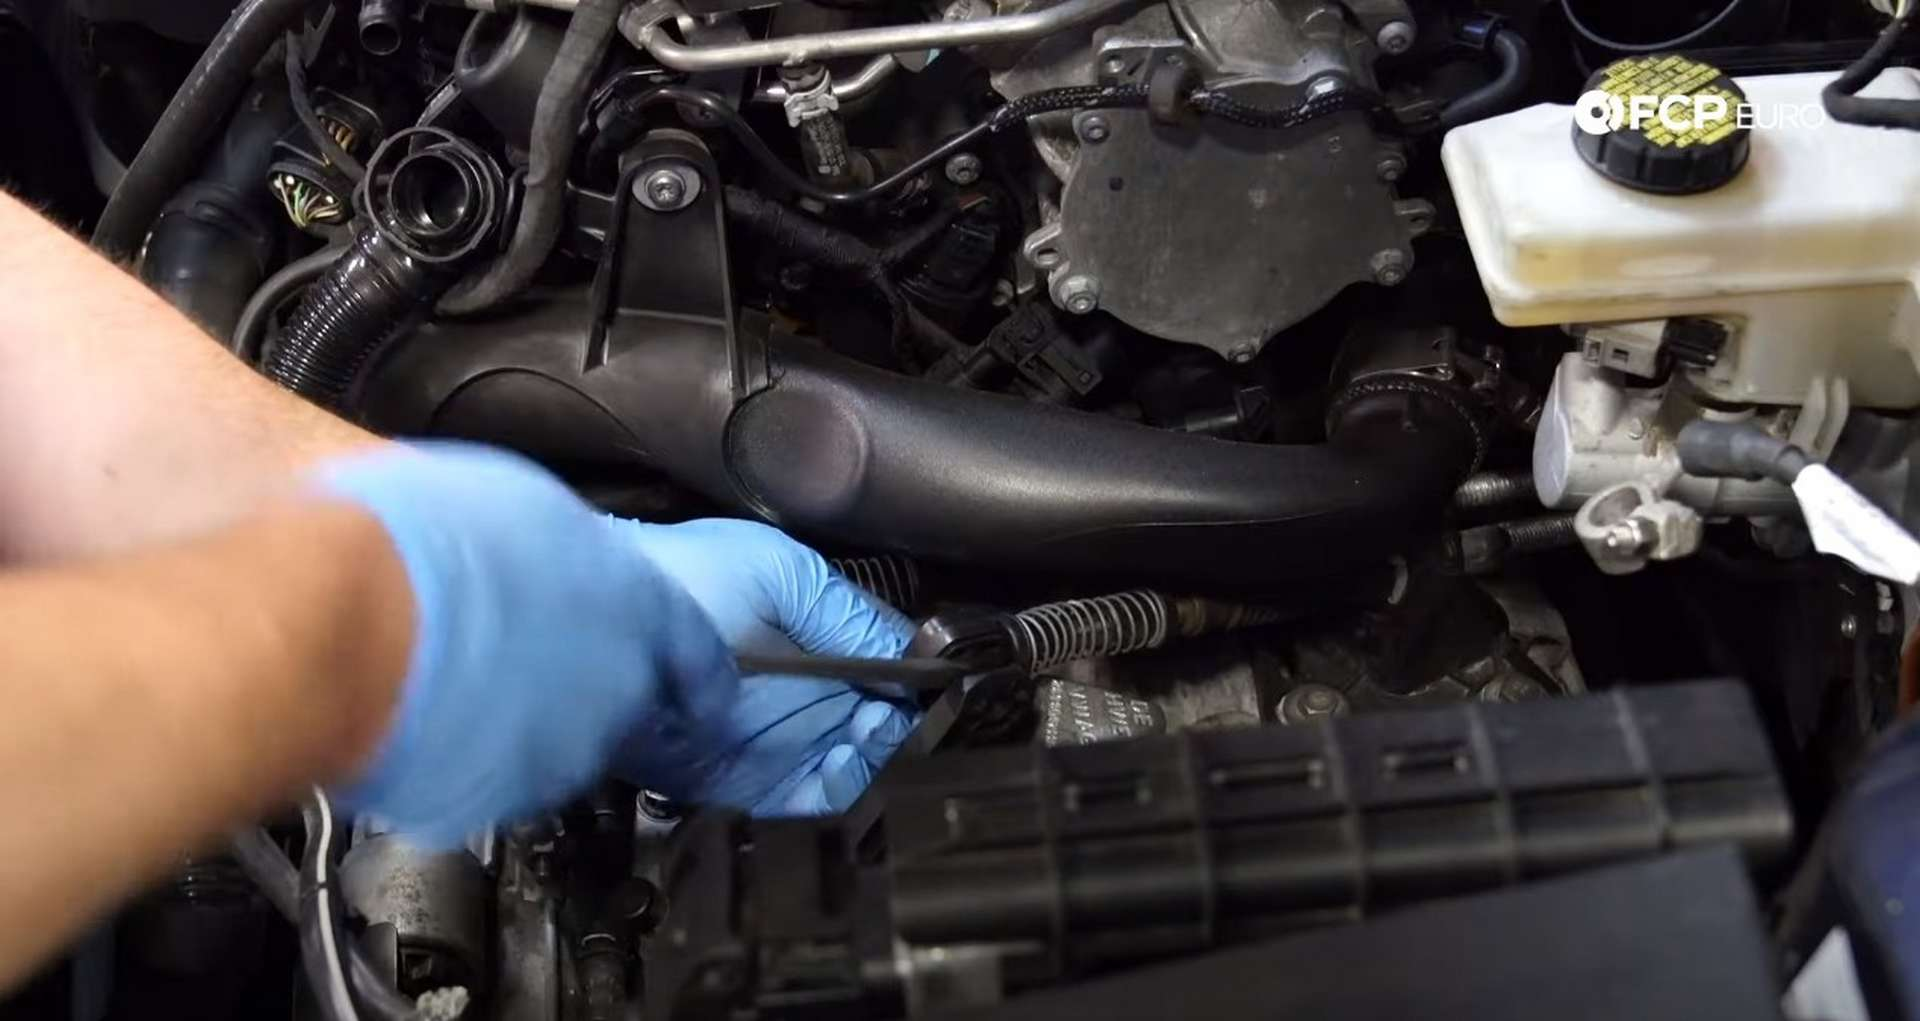 07-DIY_VW_GTI_Clutch-Job-Prepping-Topside-Transmission